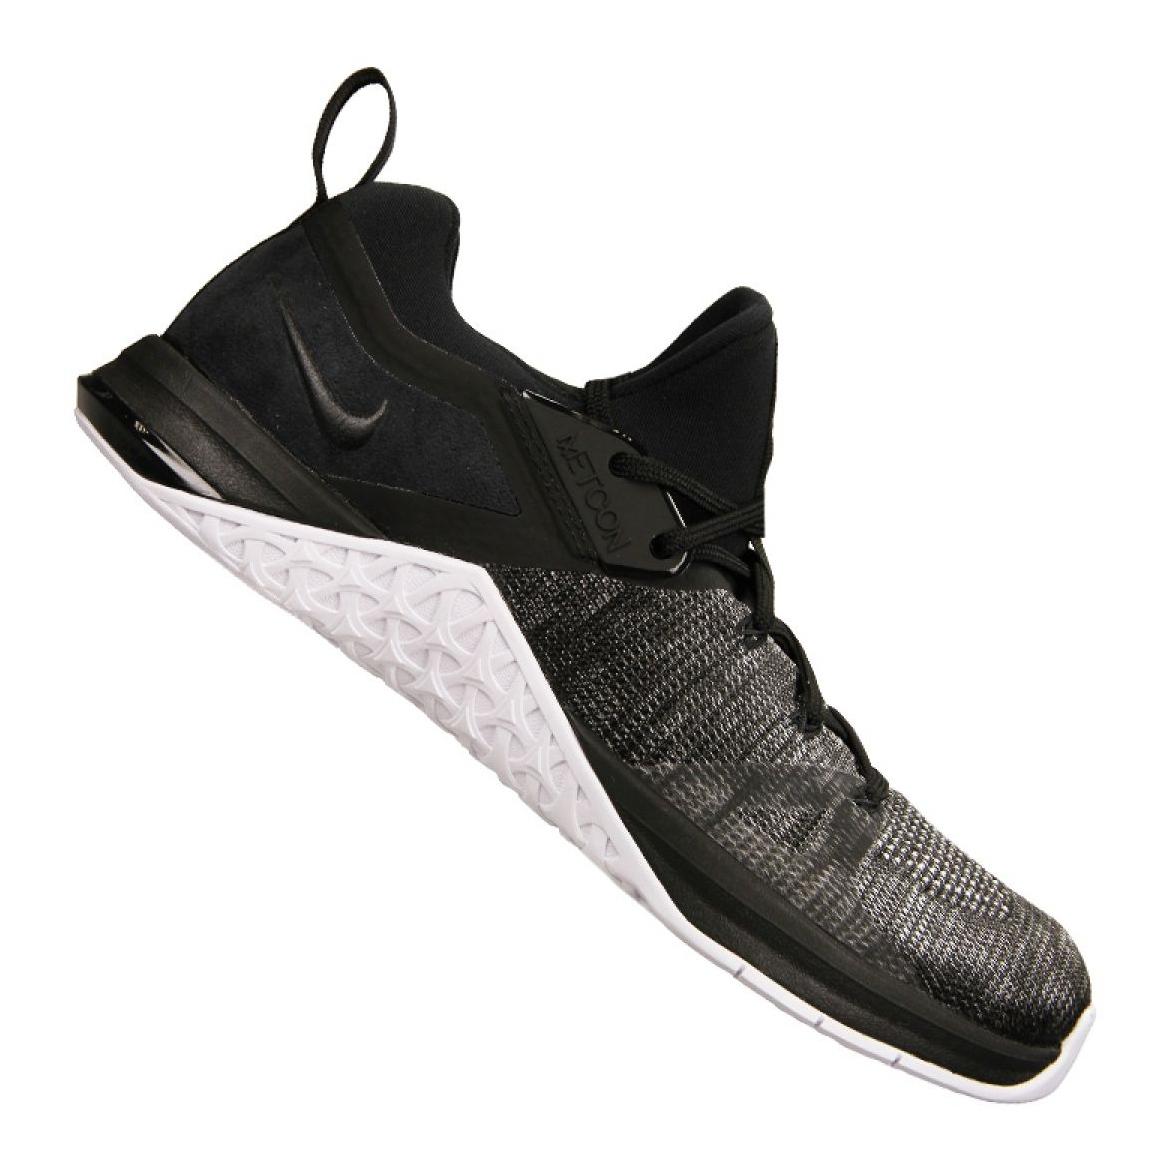 Zapatillas Nike Metcon Flyknit 3 M AQ8022 001 negro